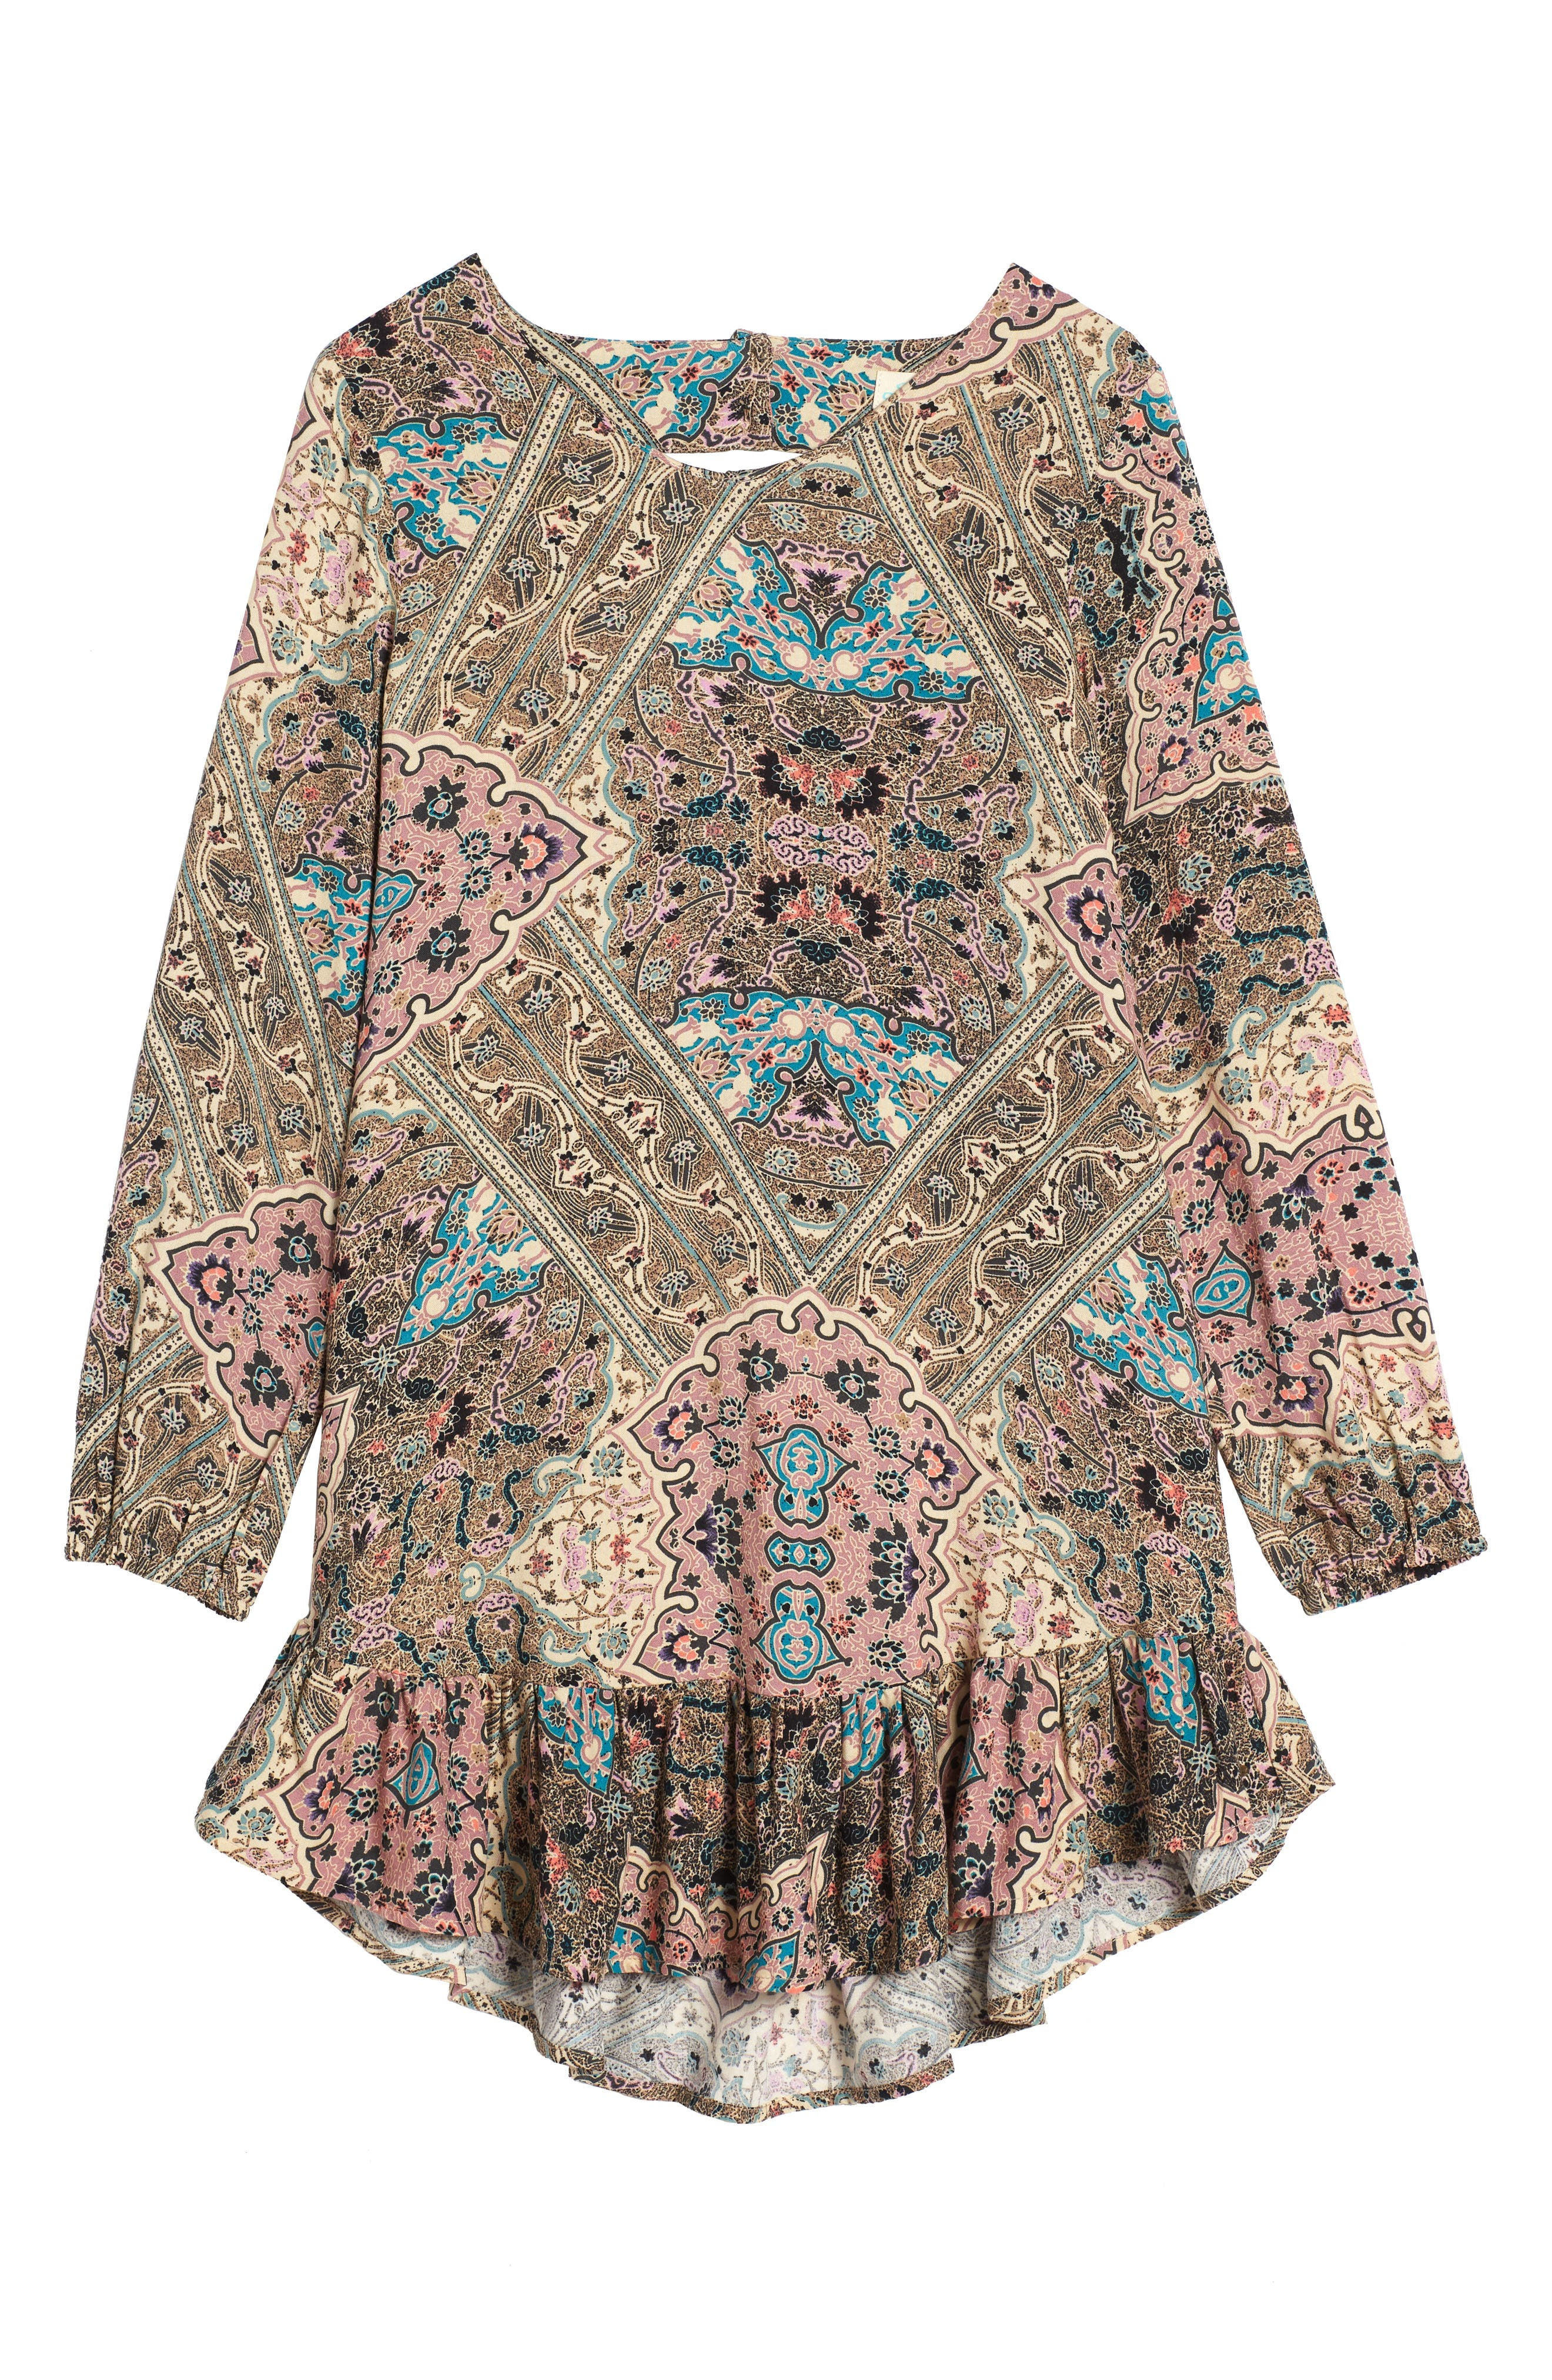 Main Image - O'Neill Samantha Print Dress (Big Girls)